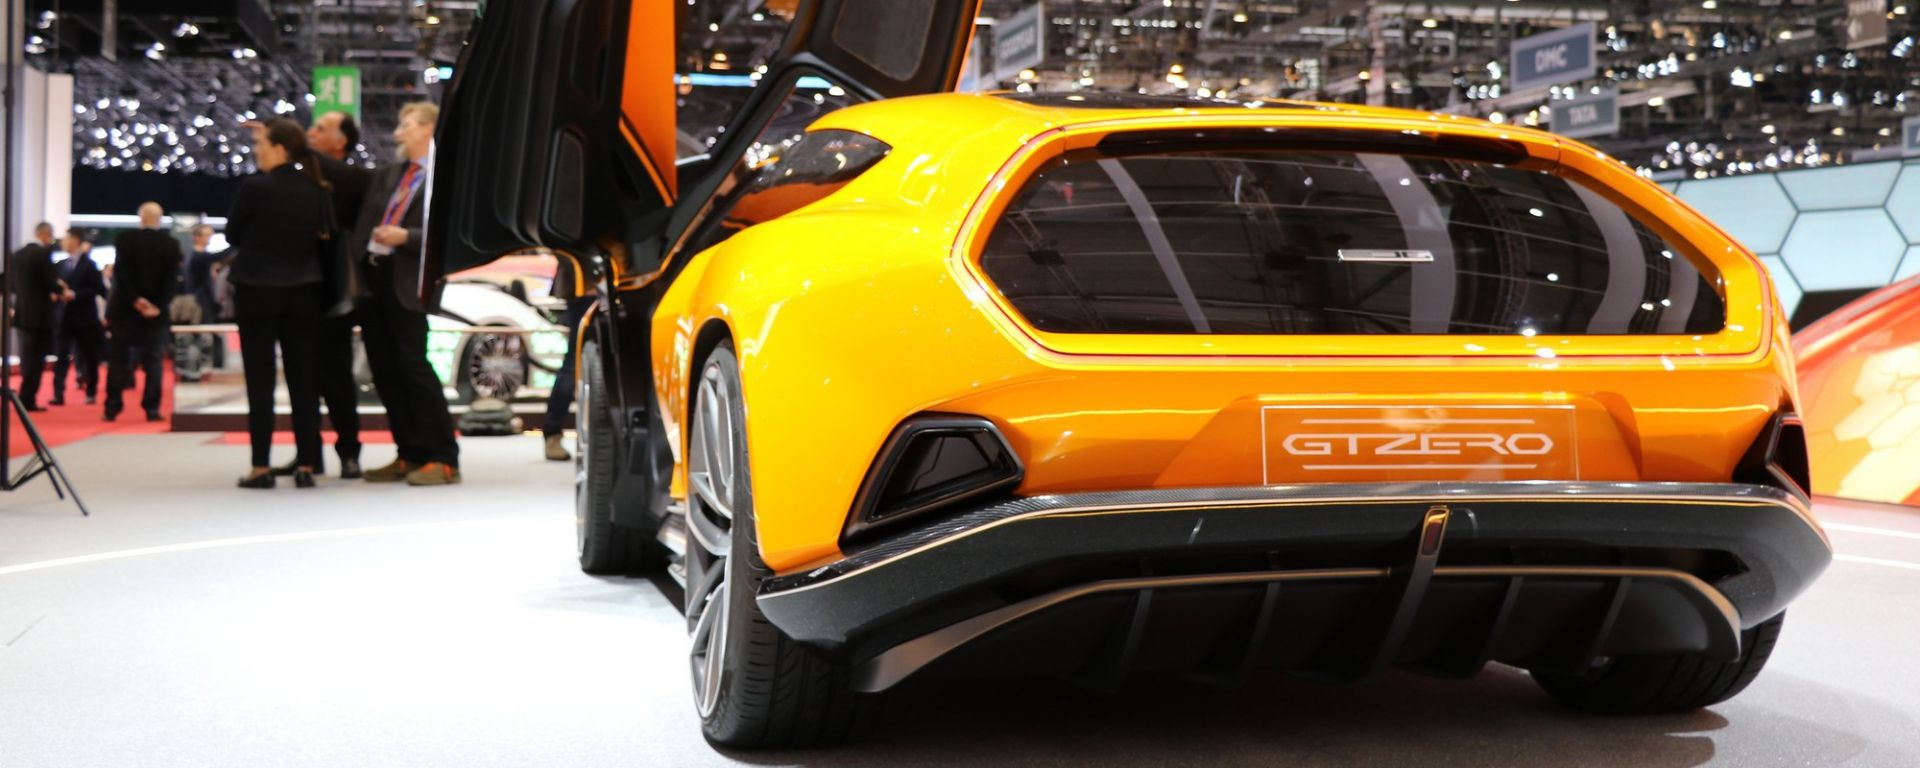 Italdesign GTZero: shooting brake all'italiana